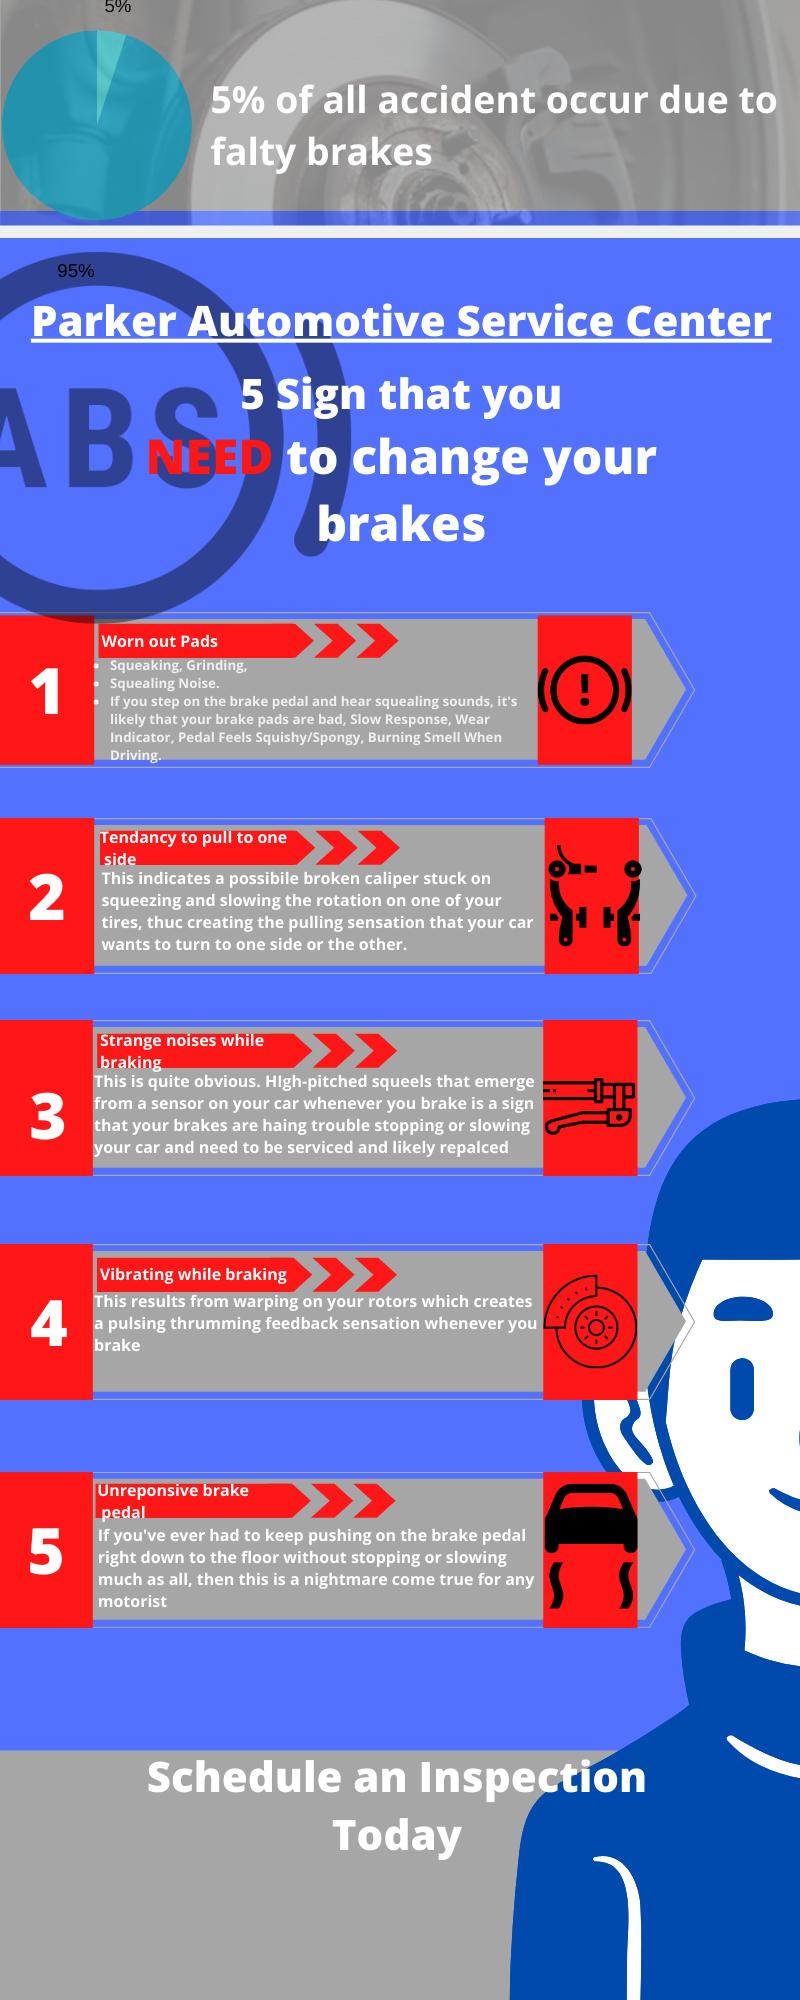 Blue Entrepreneur Personalities Business Infographic (2)